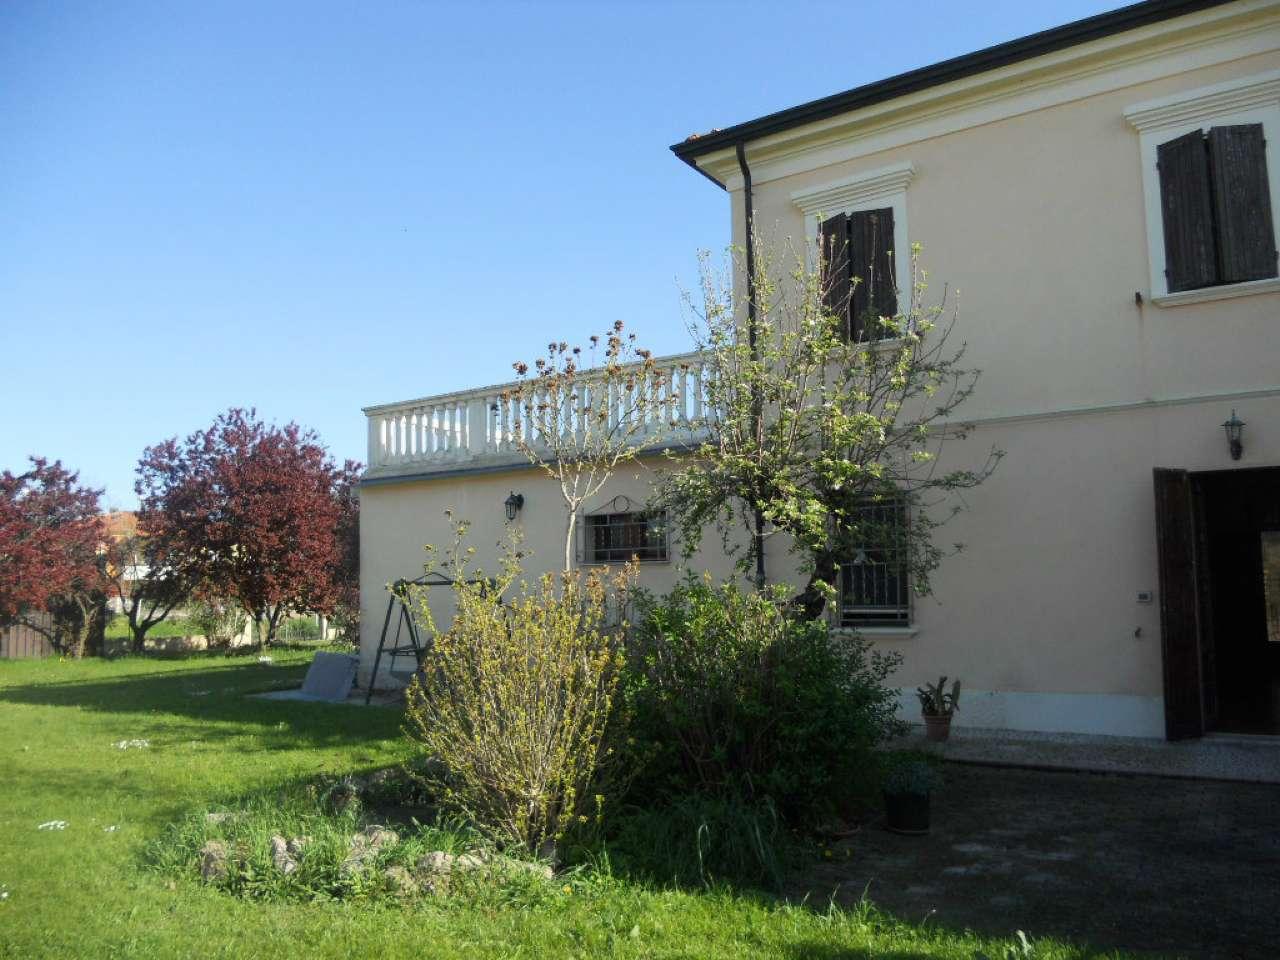 Soluzione Semindipendente in Vendita a Santarcangelo di Romagna